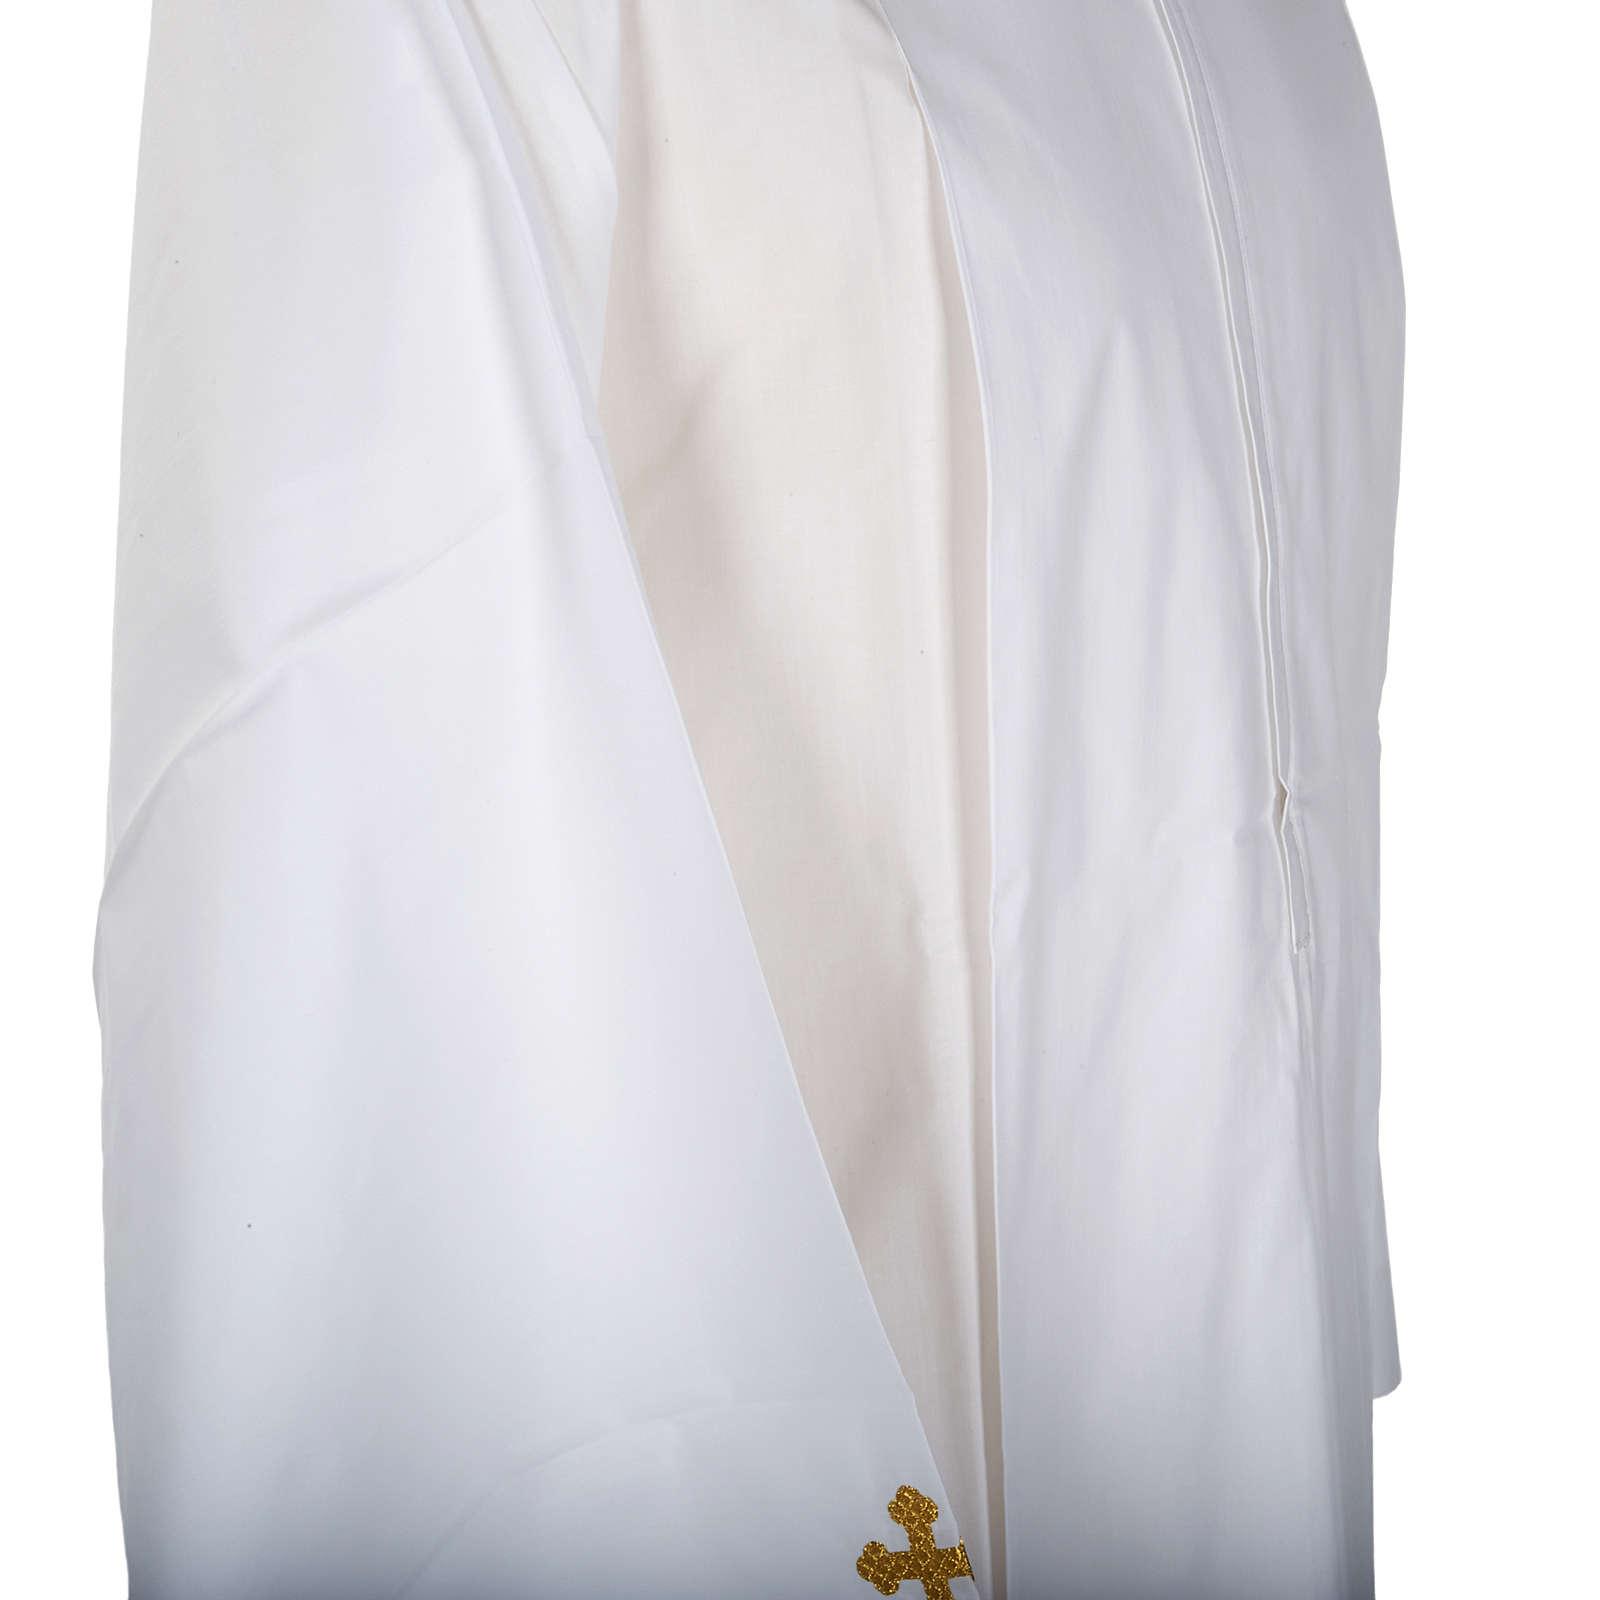 Priest alb with cross motif, cotton 4